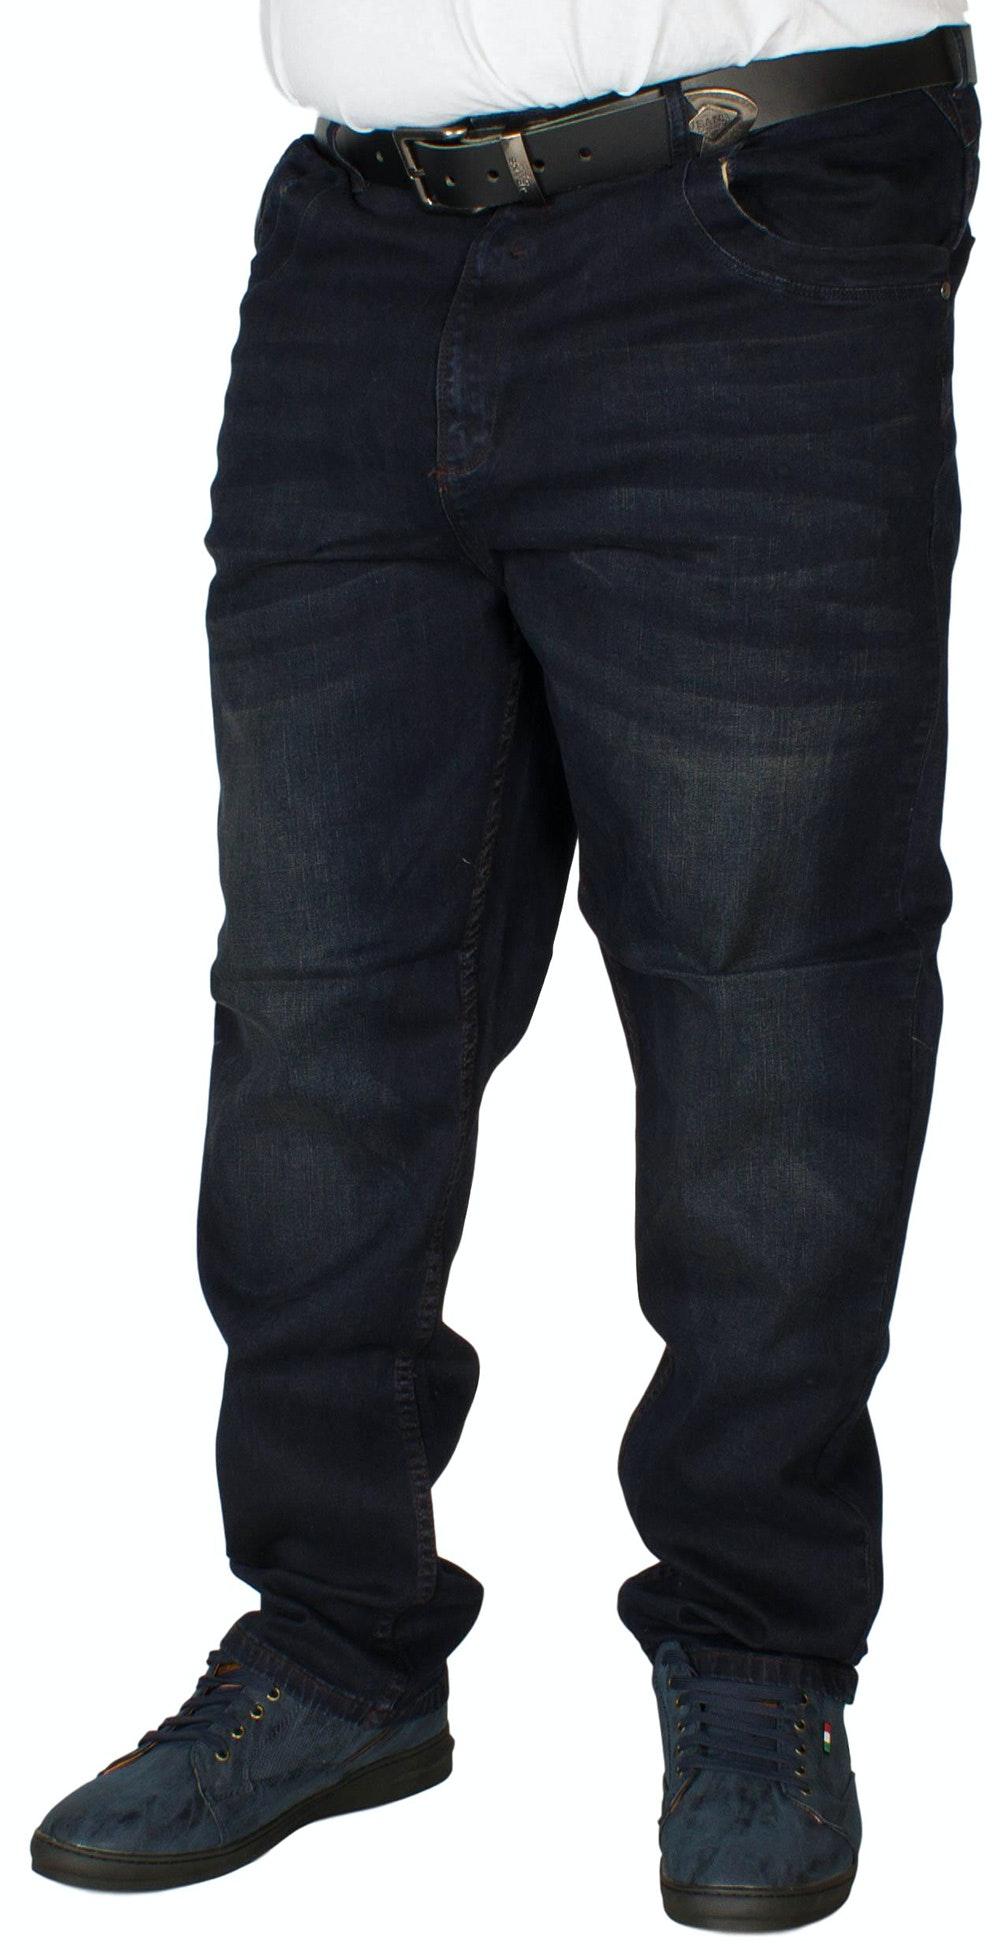 KAM Mateo Stretch Jeans Indigo